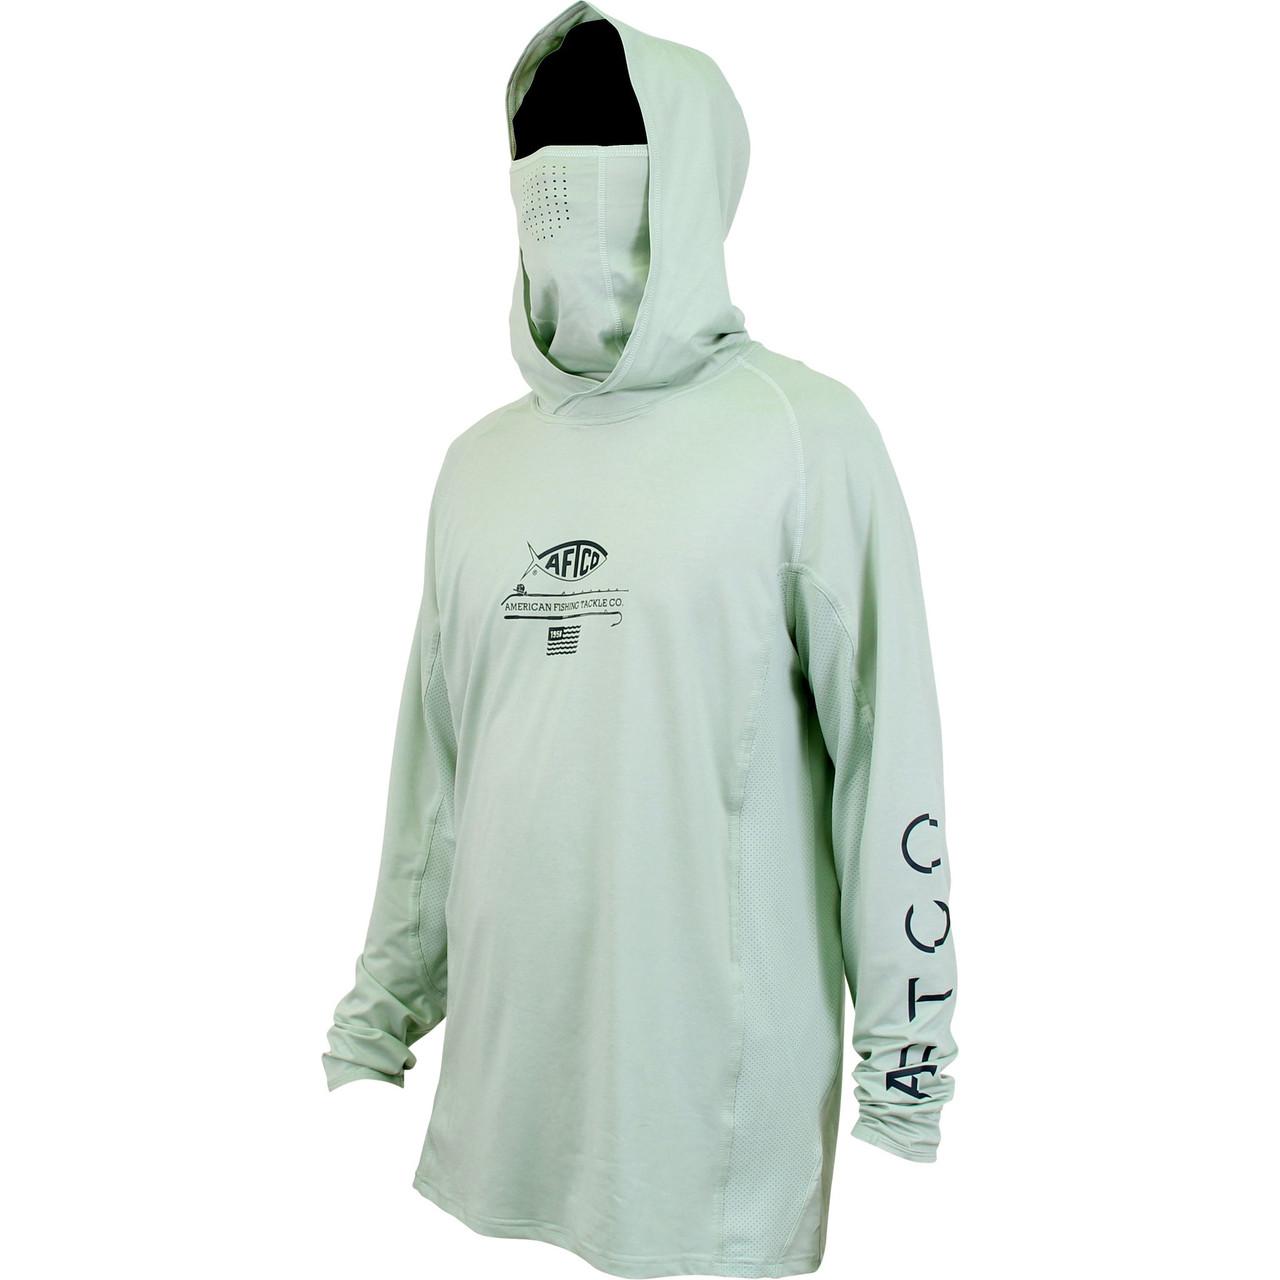 AFTCO Samurai Sun Protection Hoodie-Fishing Shirt--UPF 50 Free Shipping White